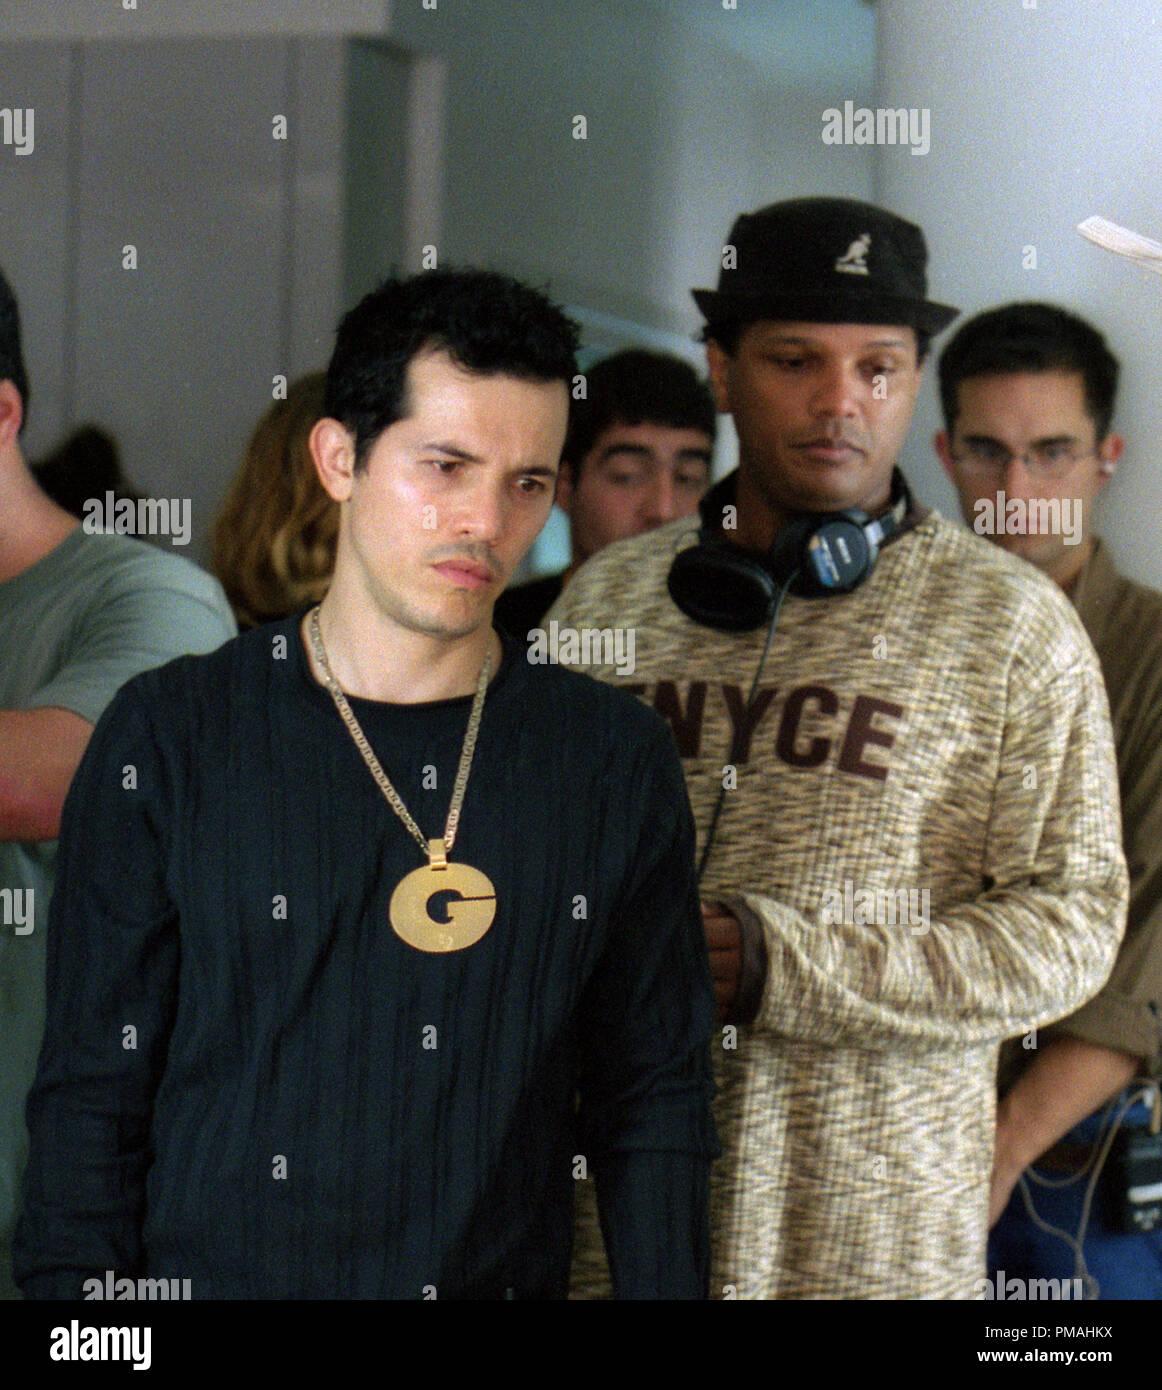 "JOHN LEGUIZAMO and director FRANC. REYES  ""Empire Two Worlds Collide"" (2002) Stock Photo"